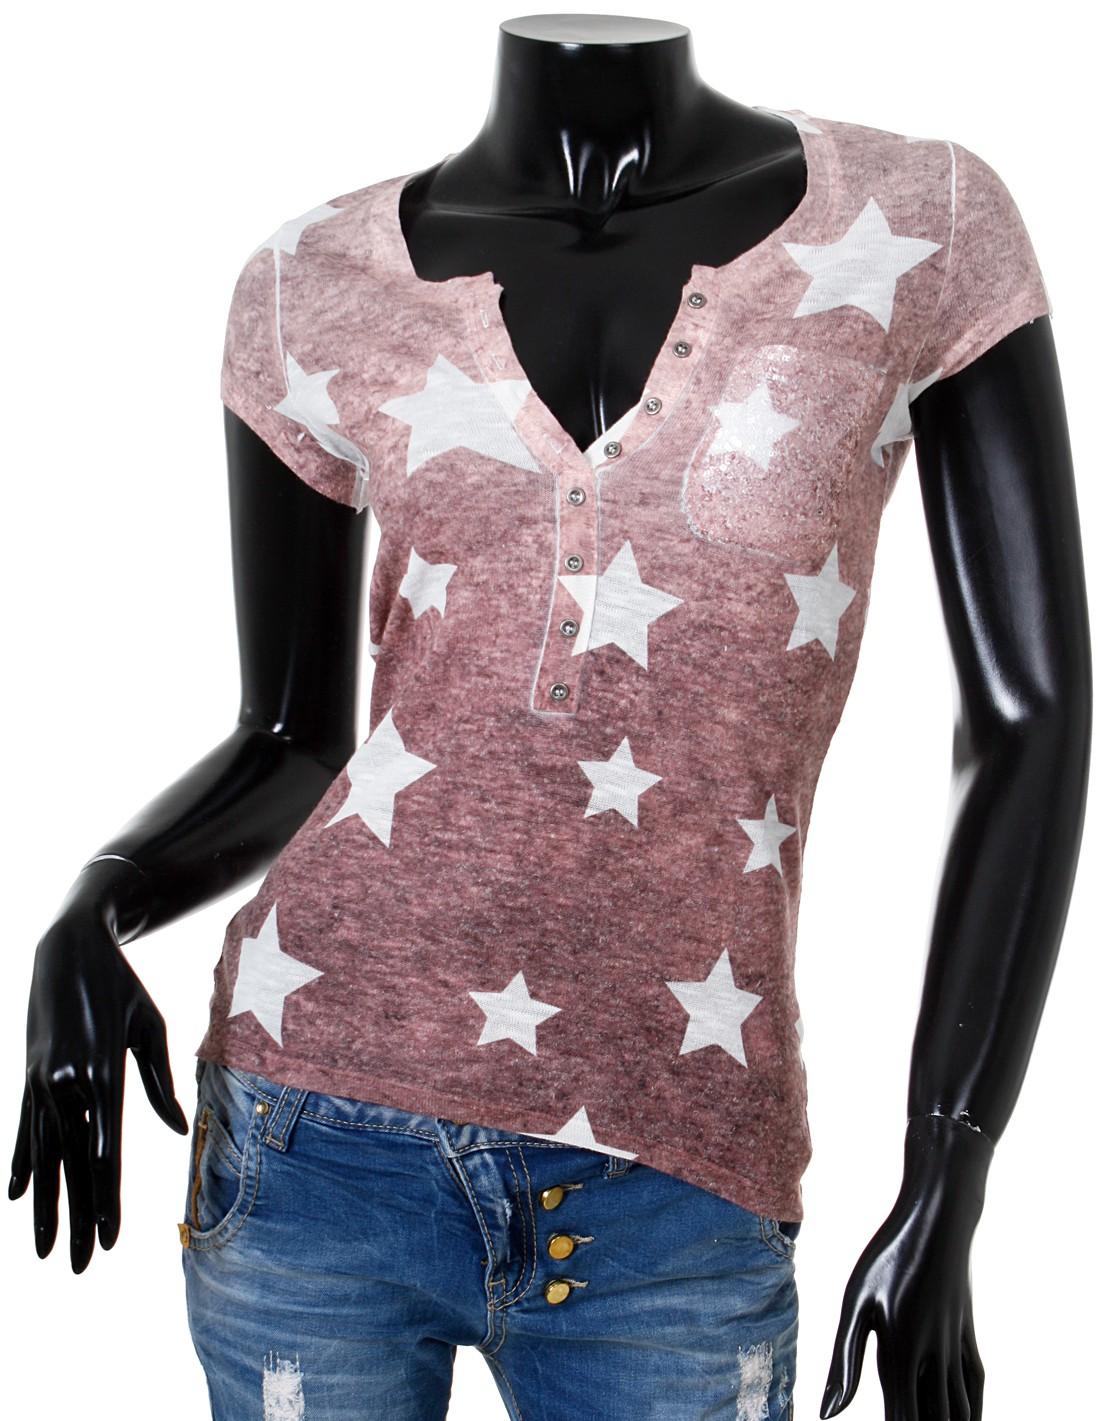 Key largo damen t shirt top shooting knopfleiste vintage - Ebay sterne ...